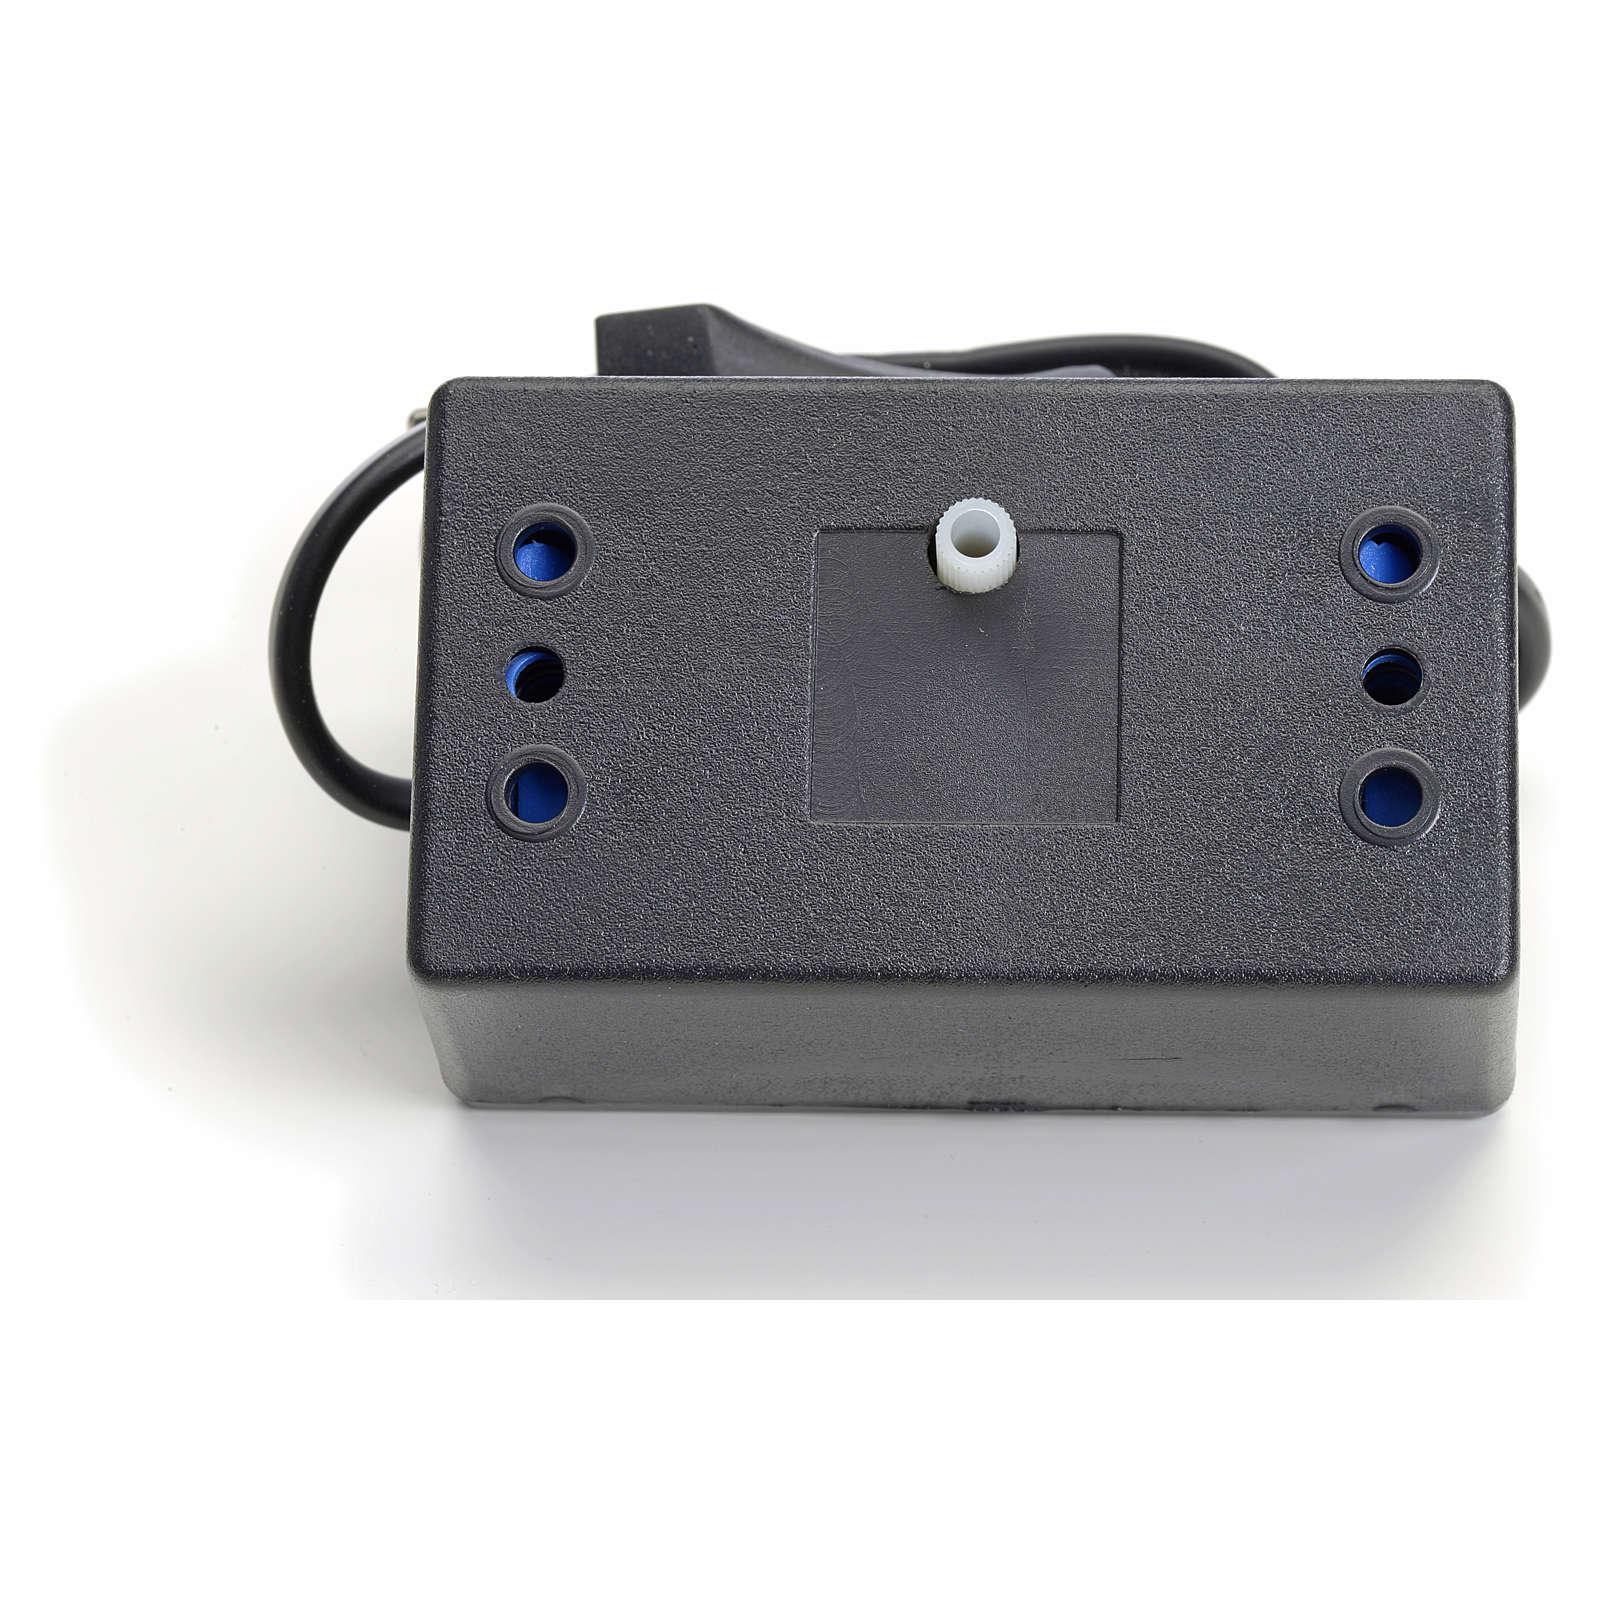 Natalino 200R: day/night fading control unit 4